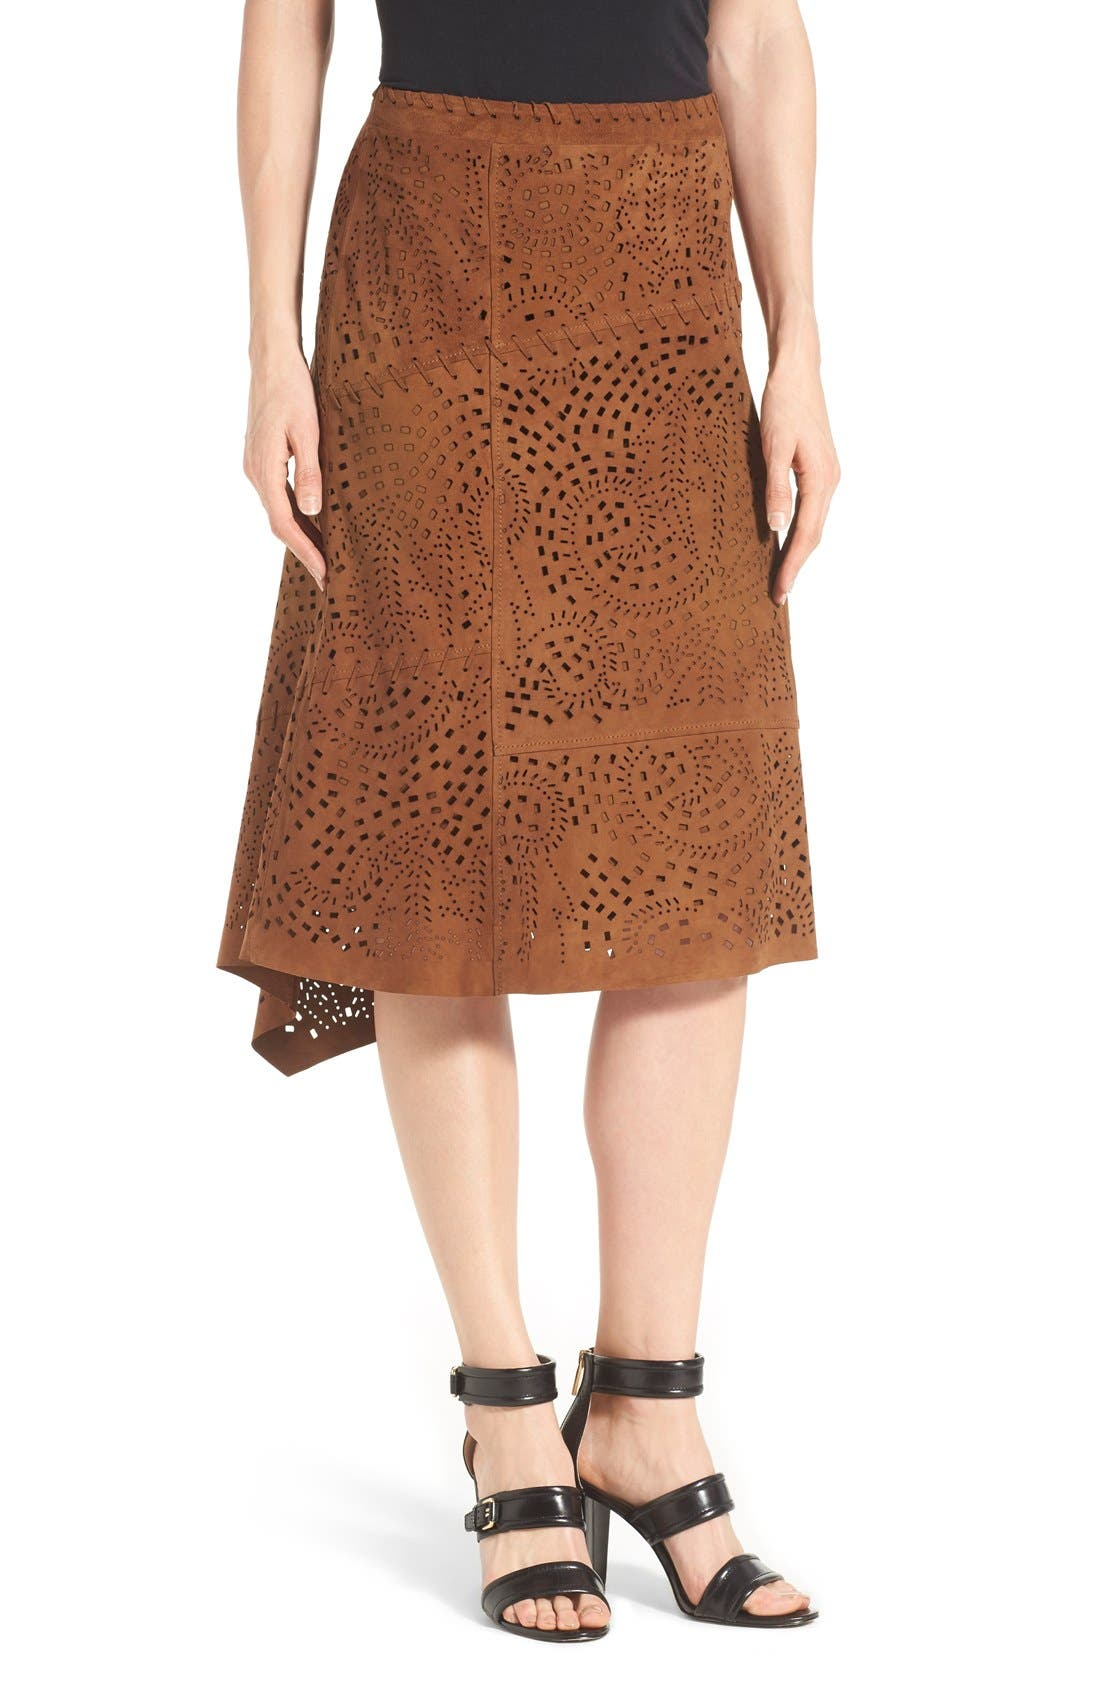 Main Image - Kobi Halperin Perforated Suede Asymmetrical A-Line Skirt